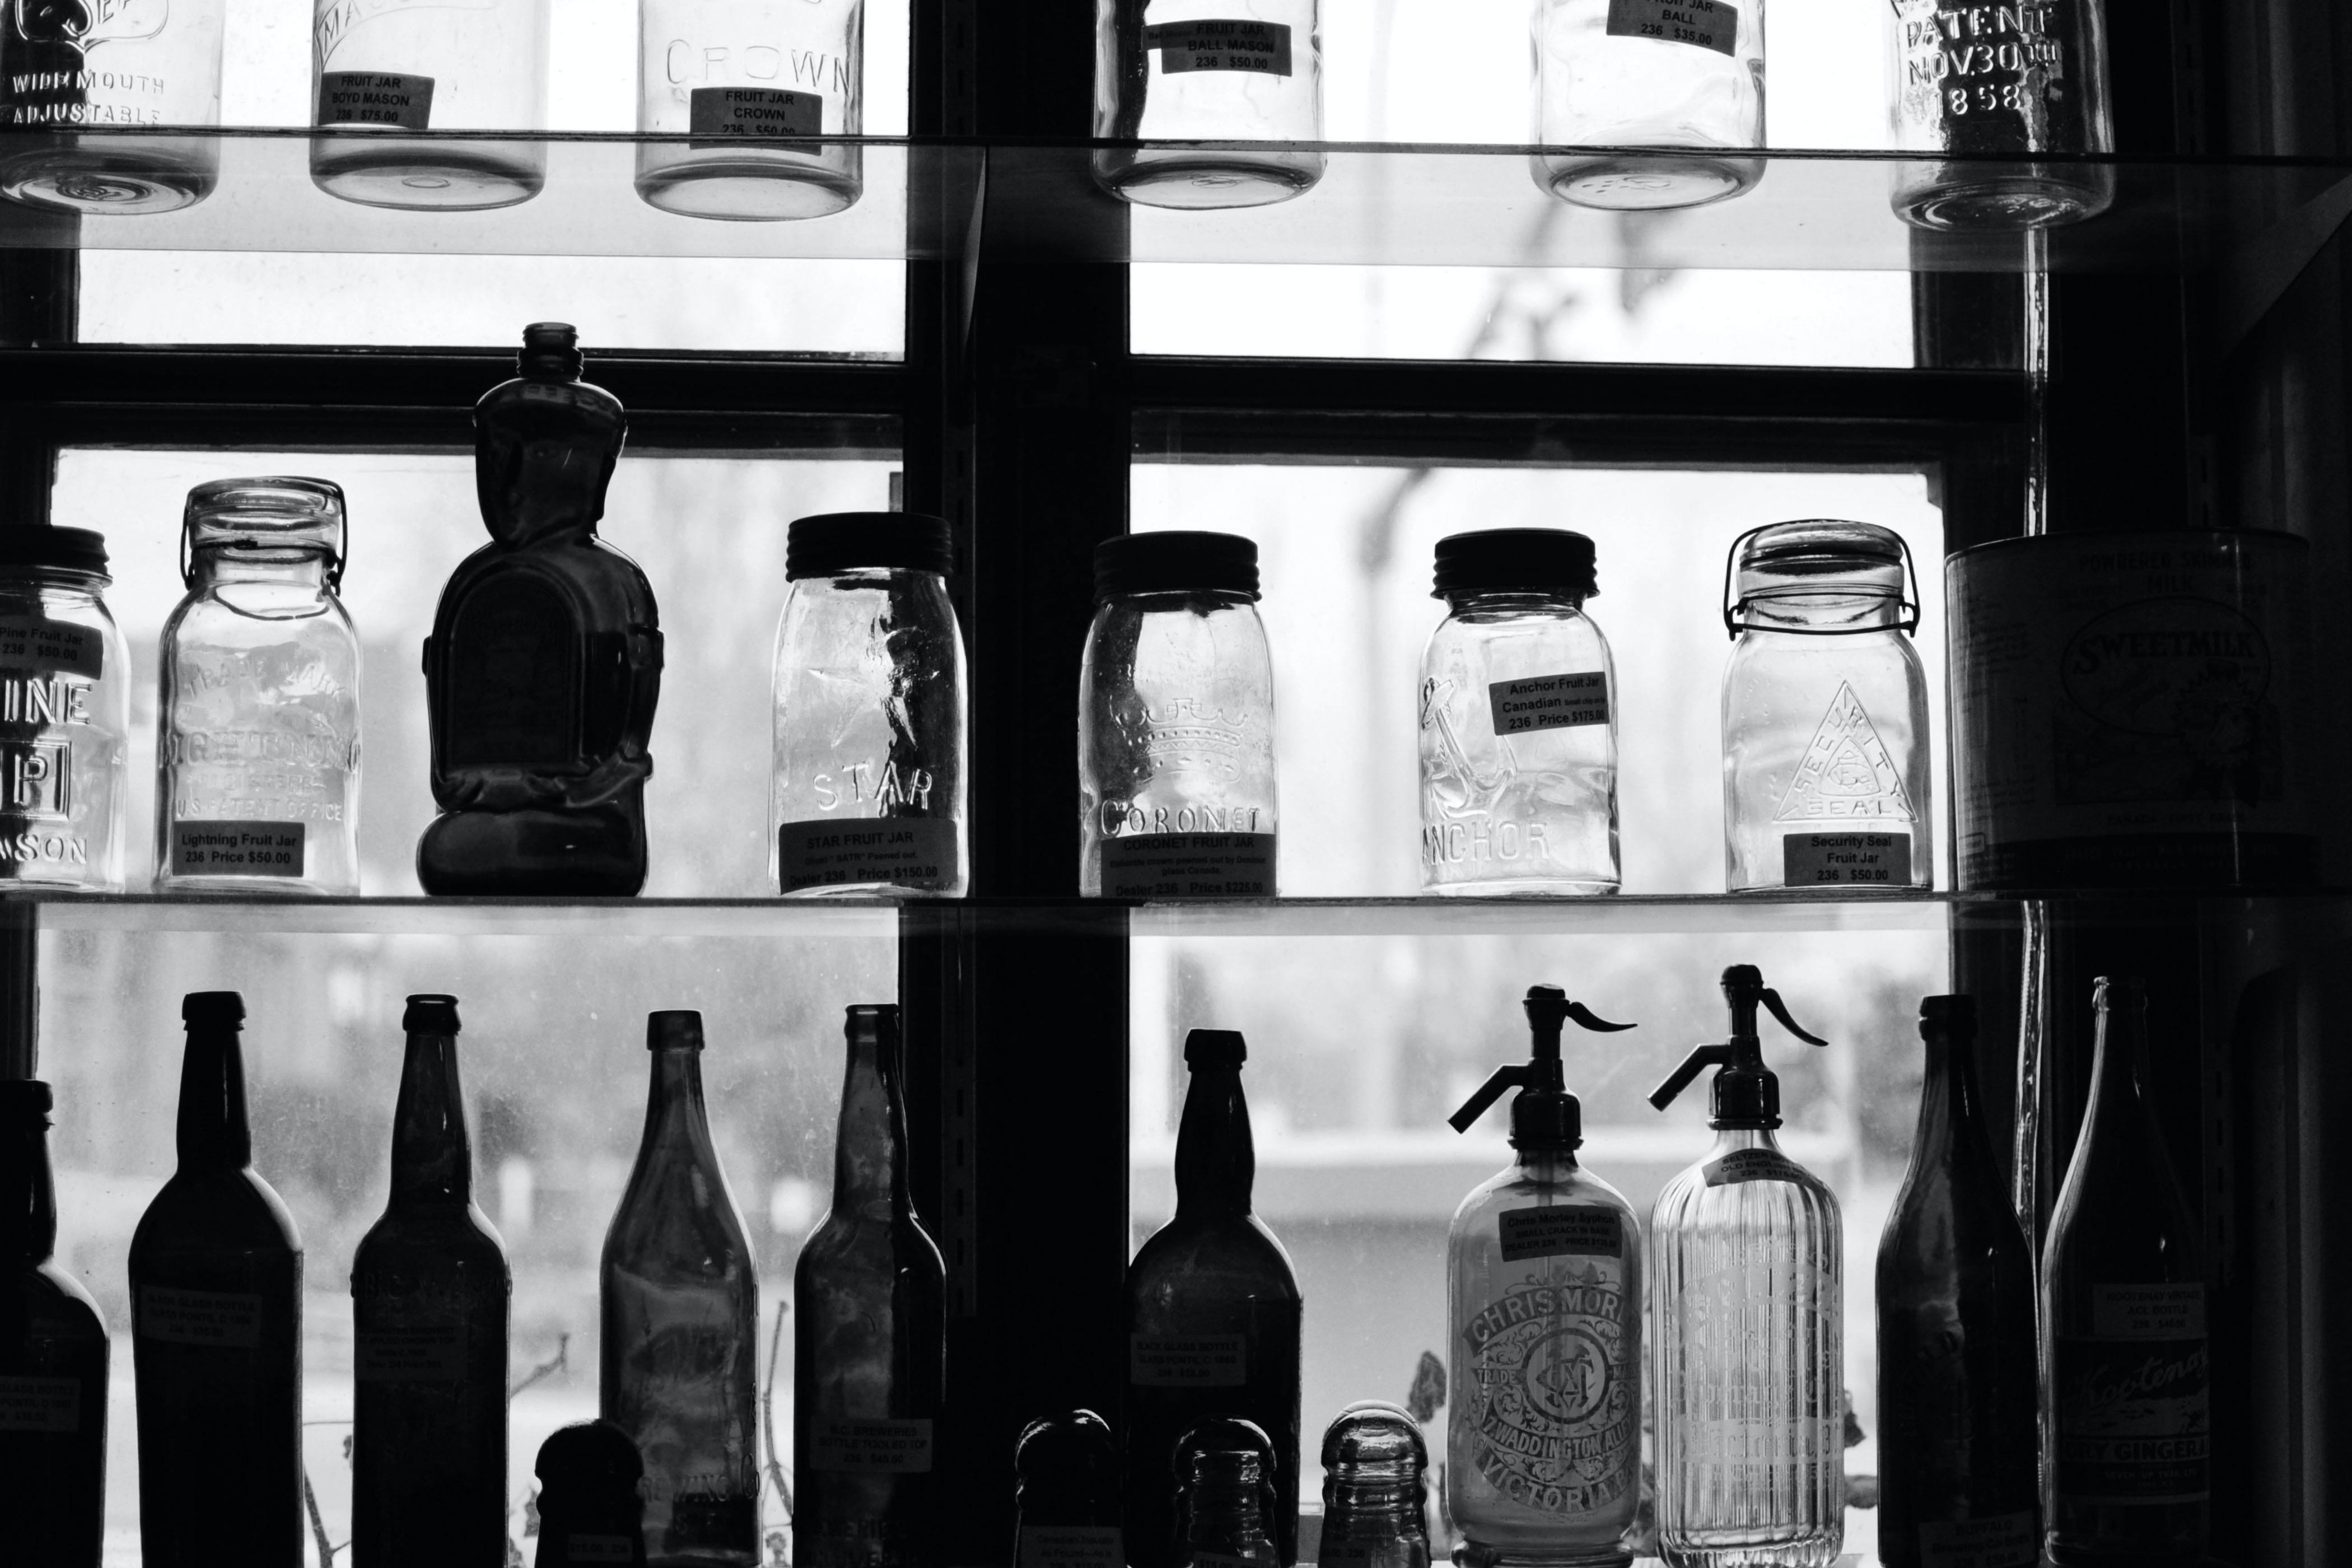 glass mason jars and bottles